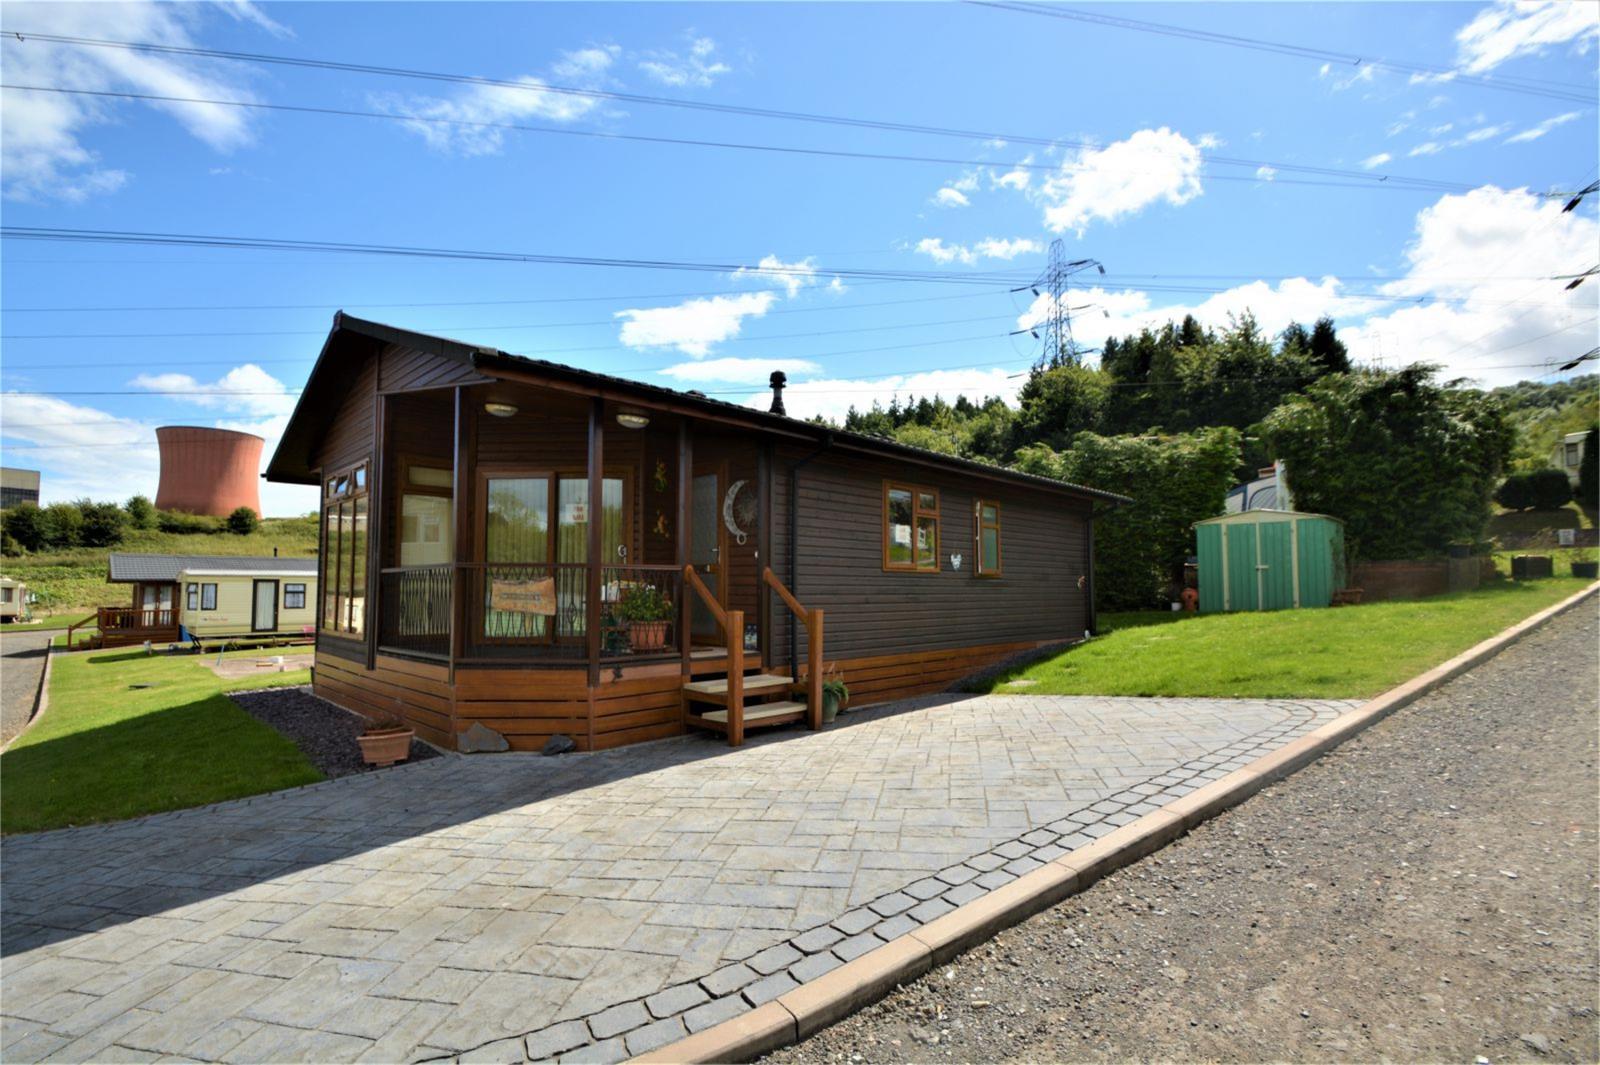 2 Bedrooms Bungalow for sale in Shanti Ghar, Pool View Caravan Park, Buildwas, Shropshire, TF8